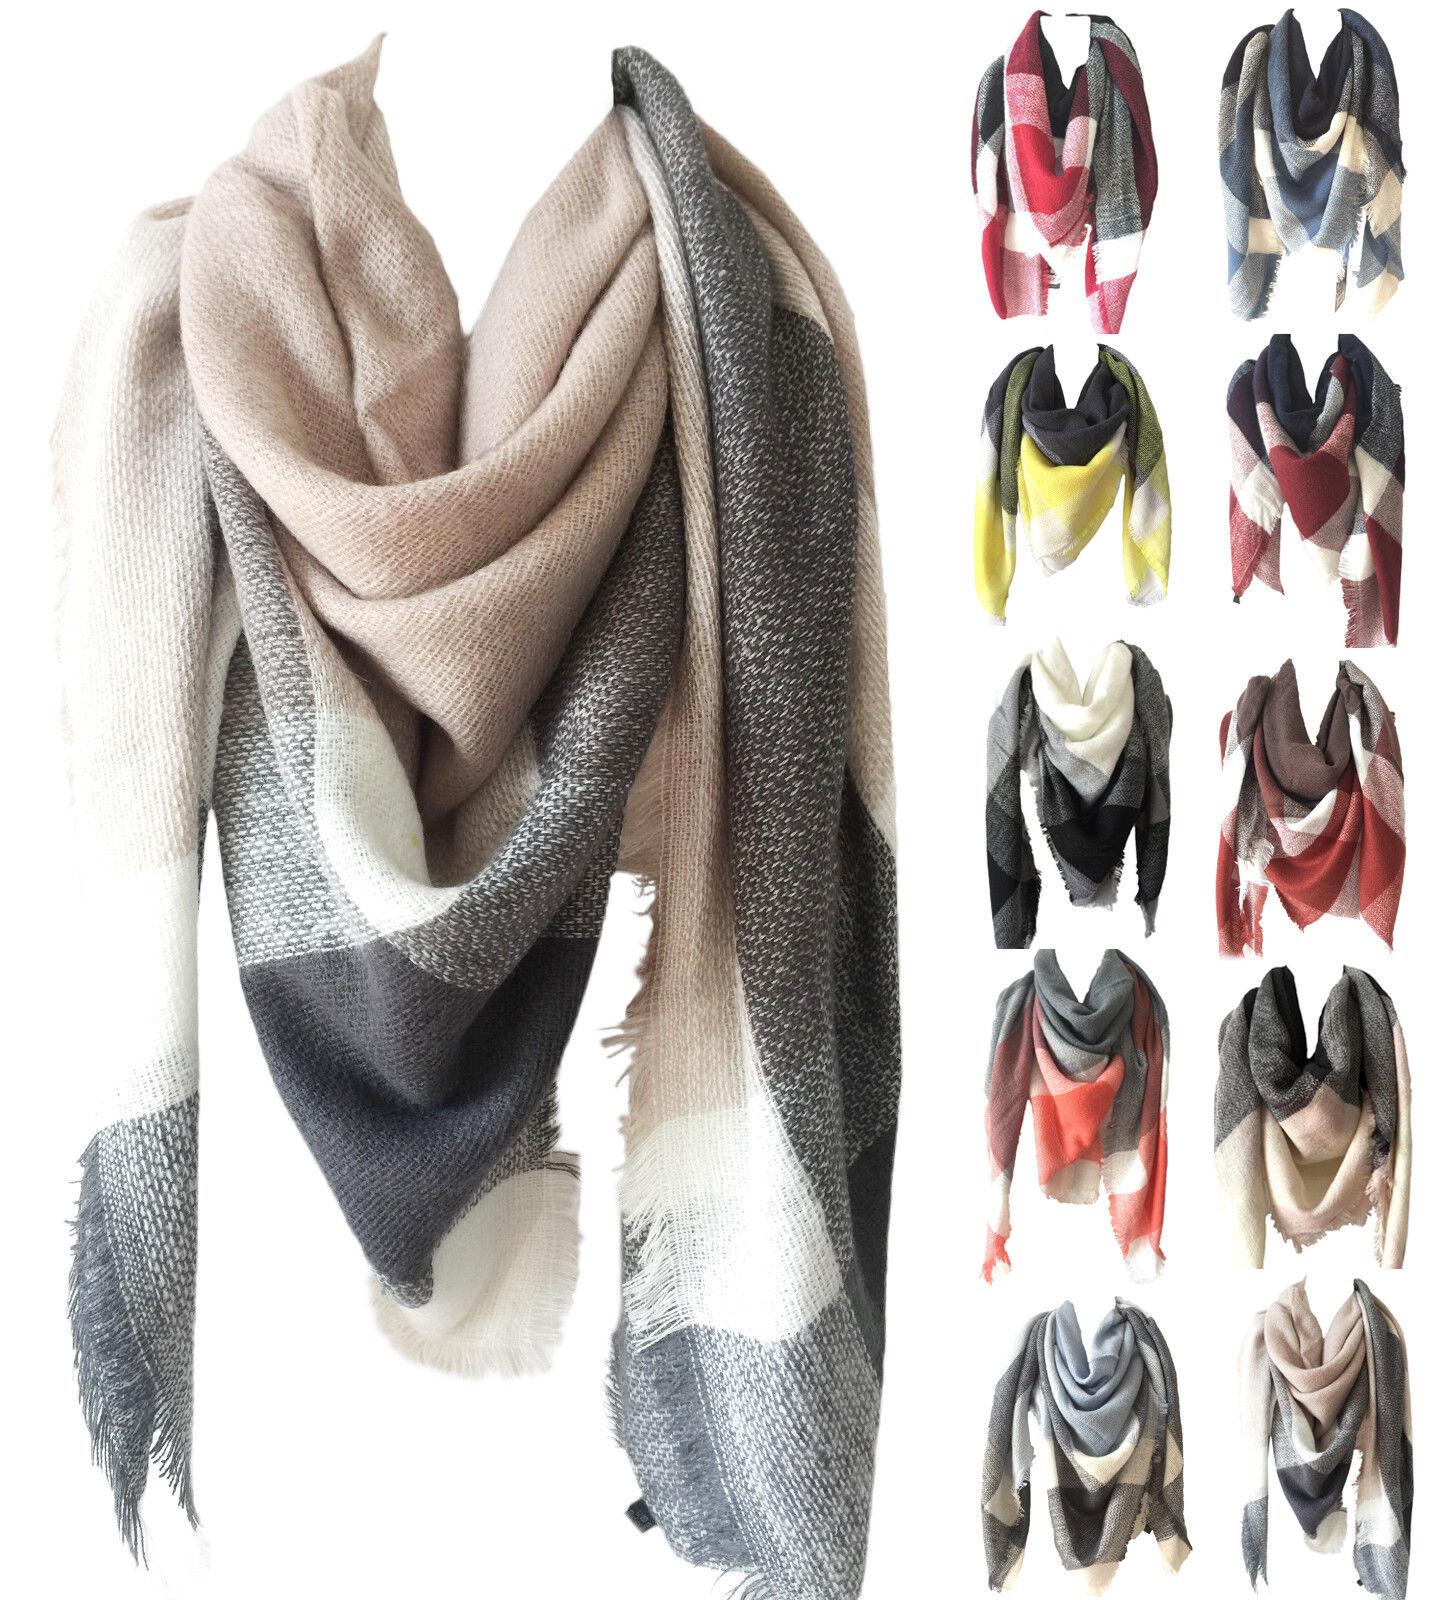 Scarf - Womens Oversized Tartan Plaid Blanket Scarf Large Checked Wrap Shawl Winter CHIC